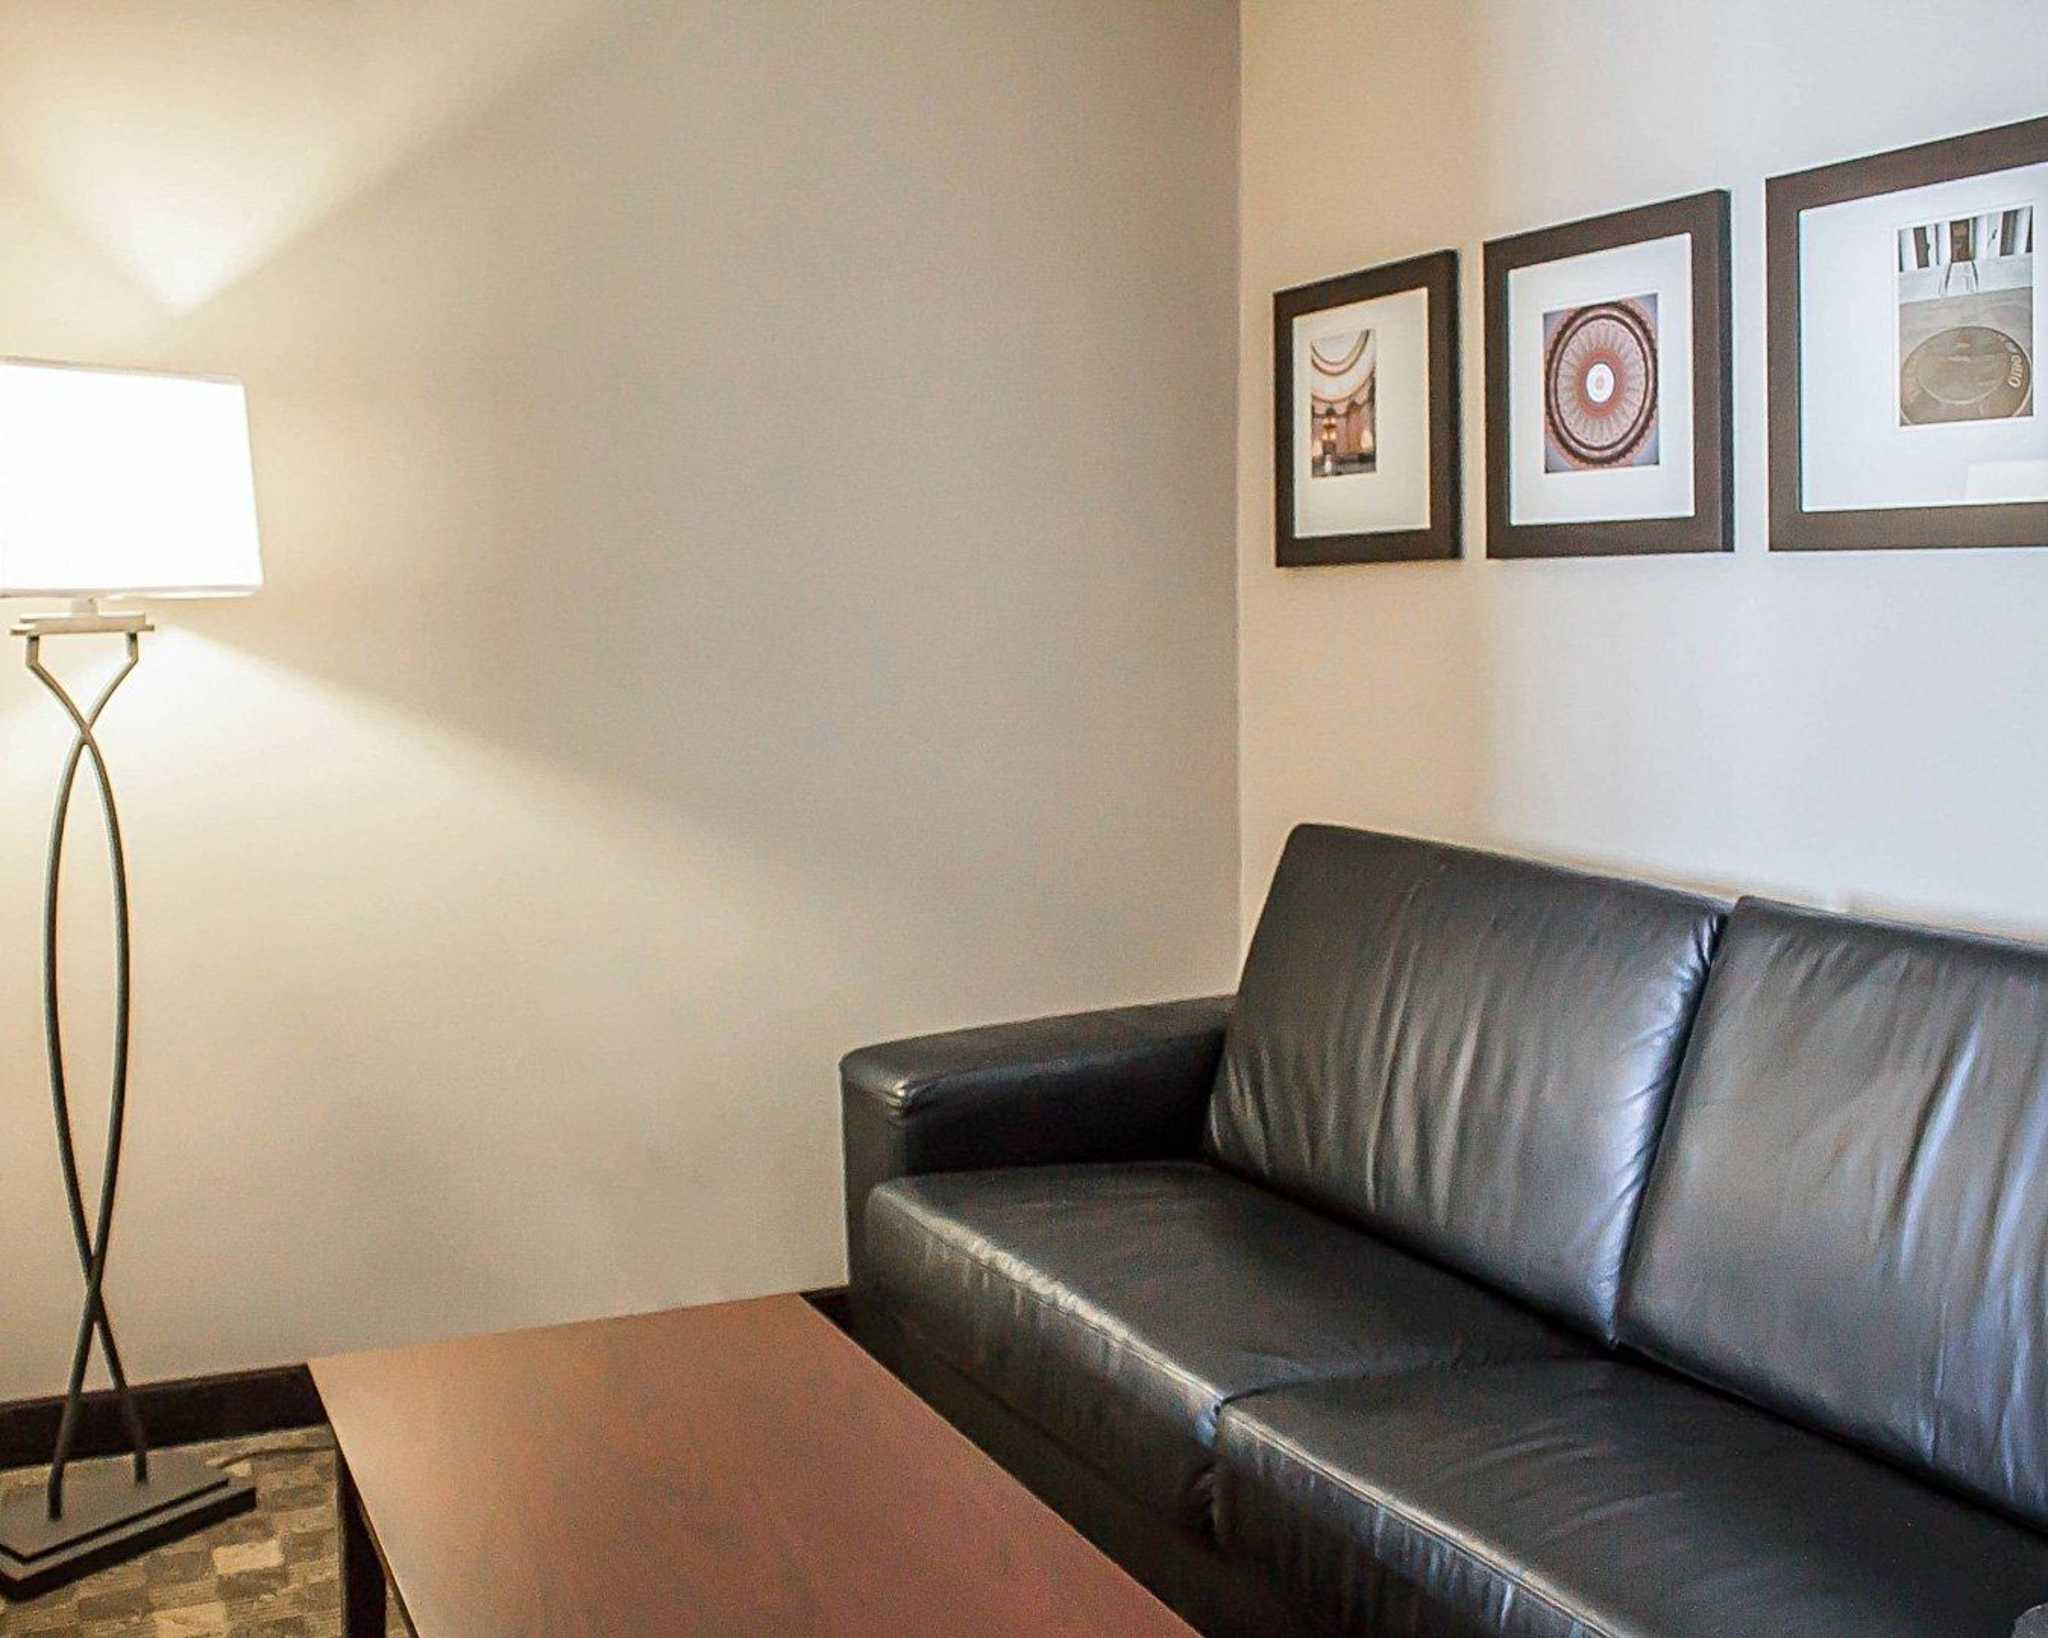 Comfort Suites Perrysburg - Toledo South image 21